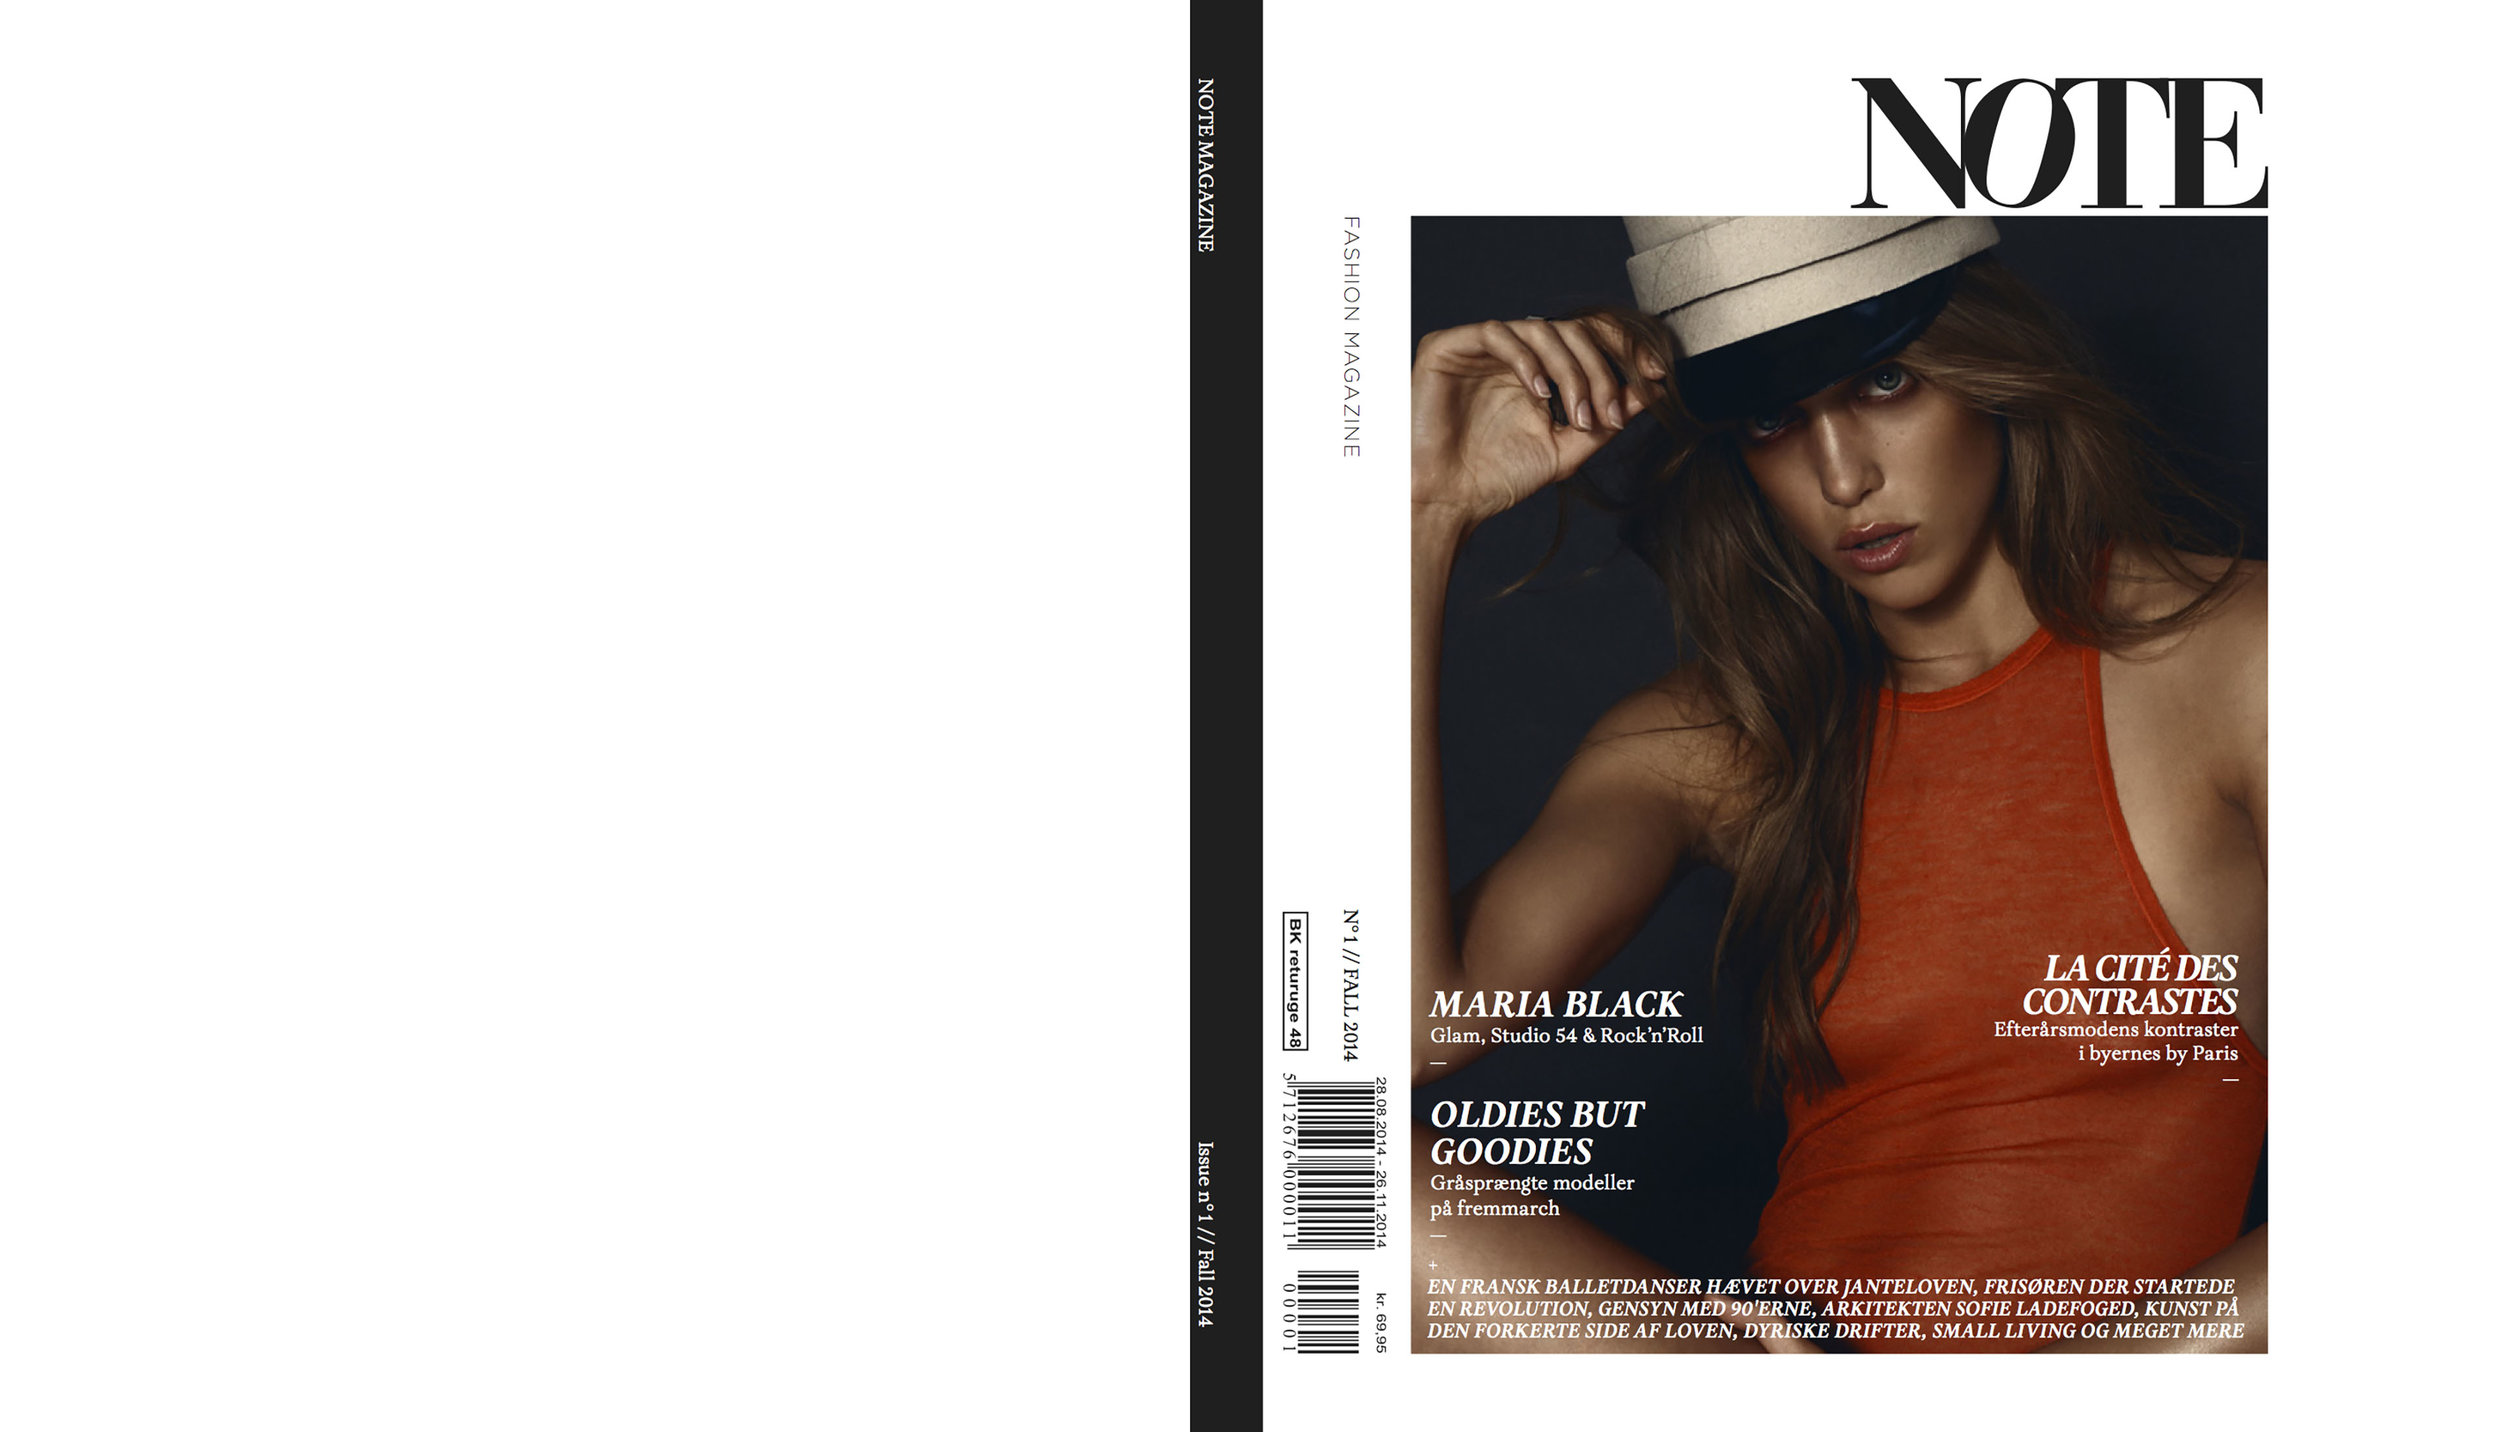 sofie-ladefoged-press-note-magazine-2014-page-06.jpg